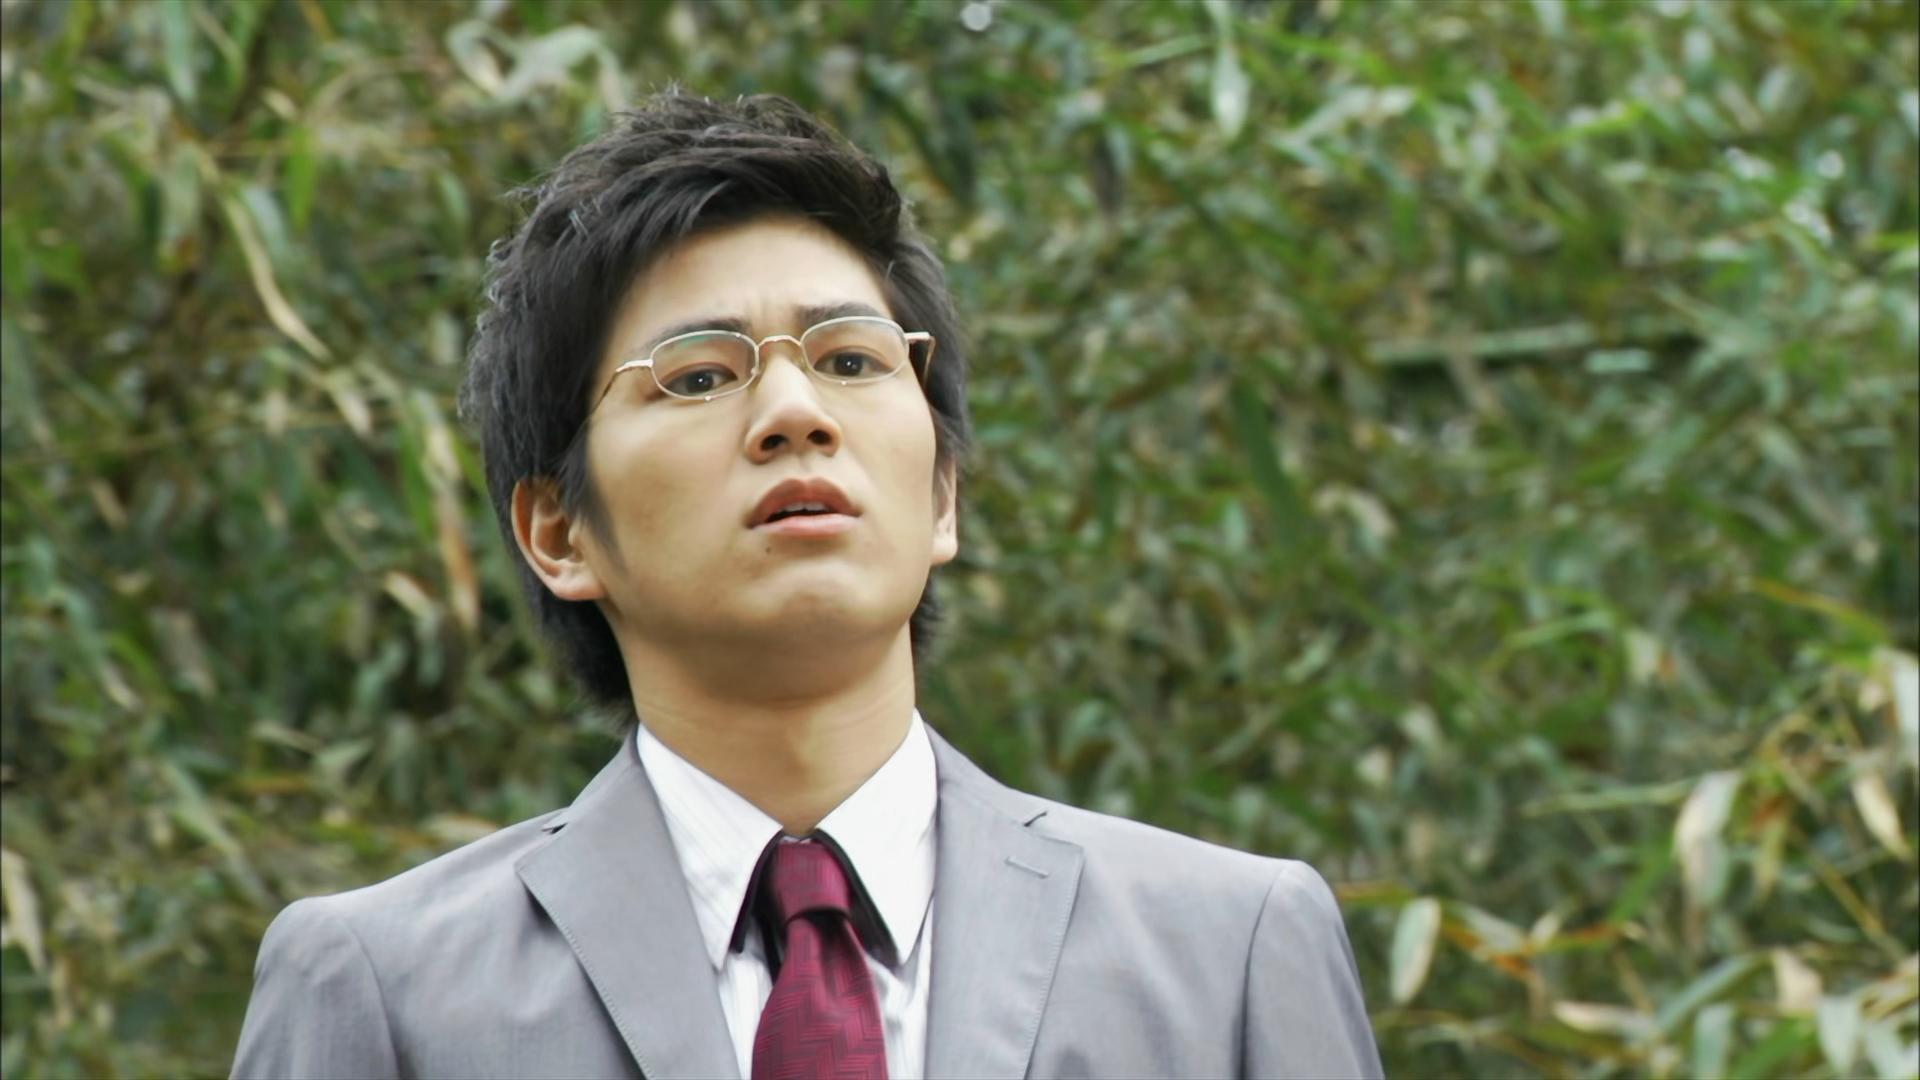 Yuichi Kitamura